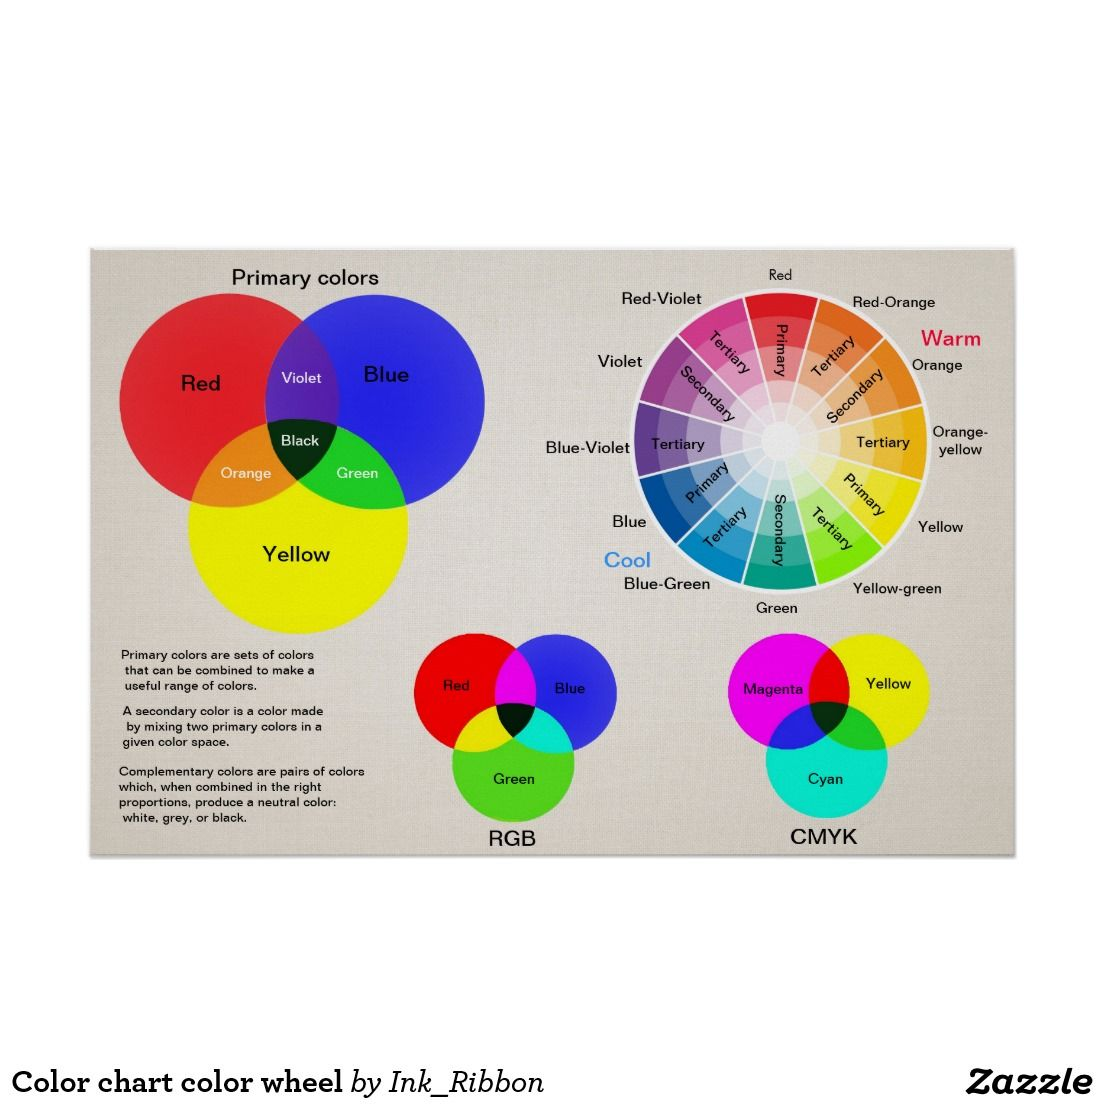 Color chart color wheel | More Color wheels and Colour chart ideas